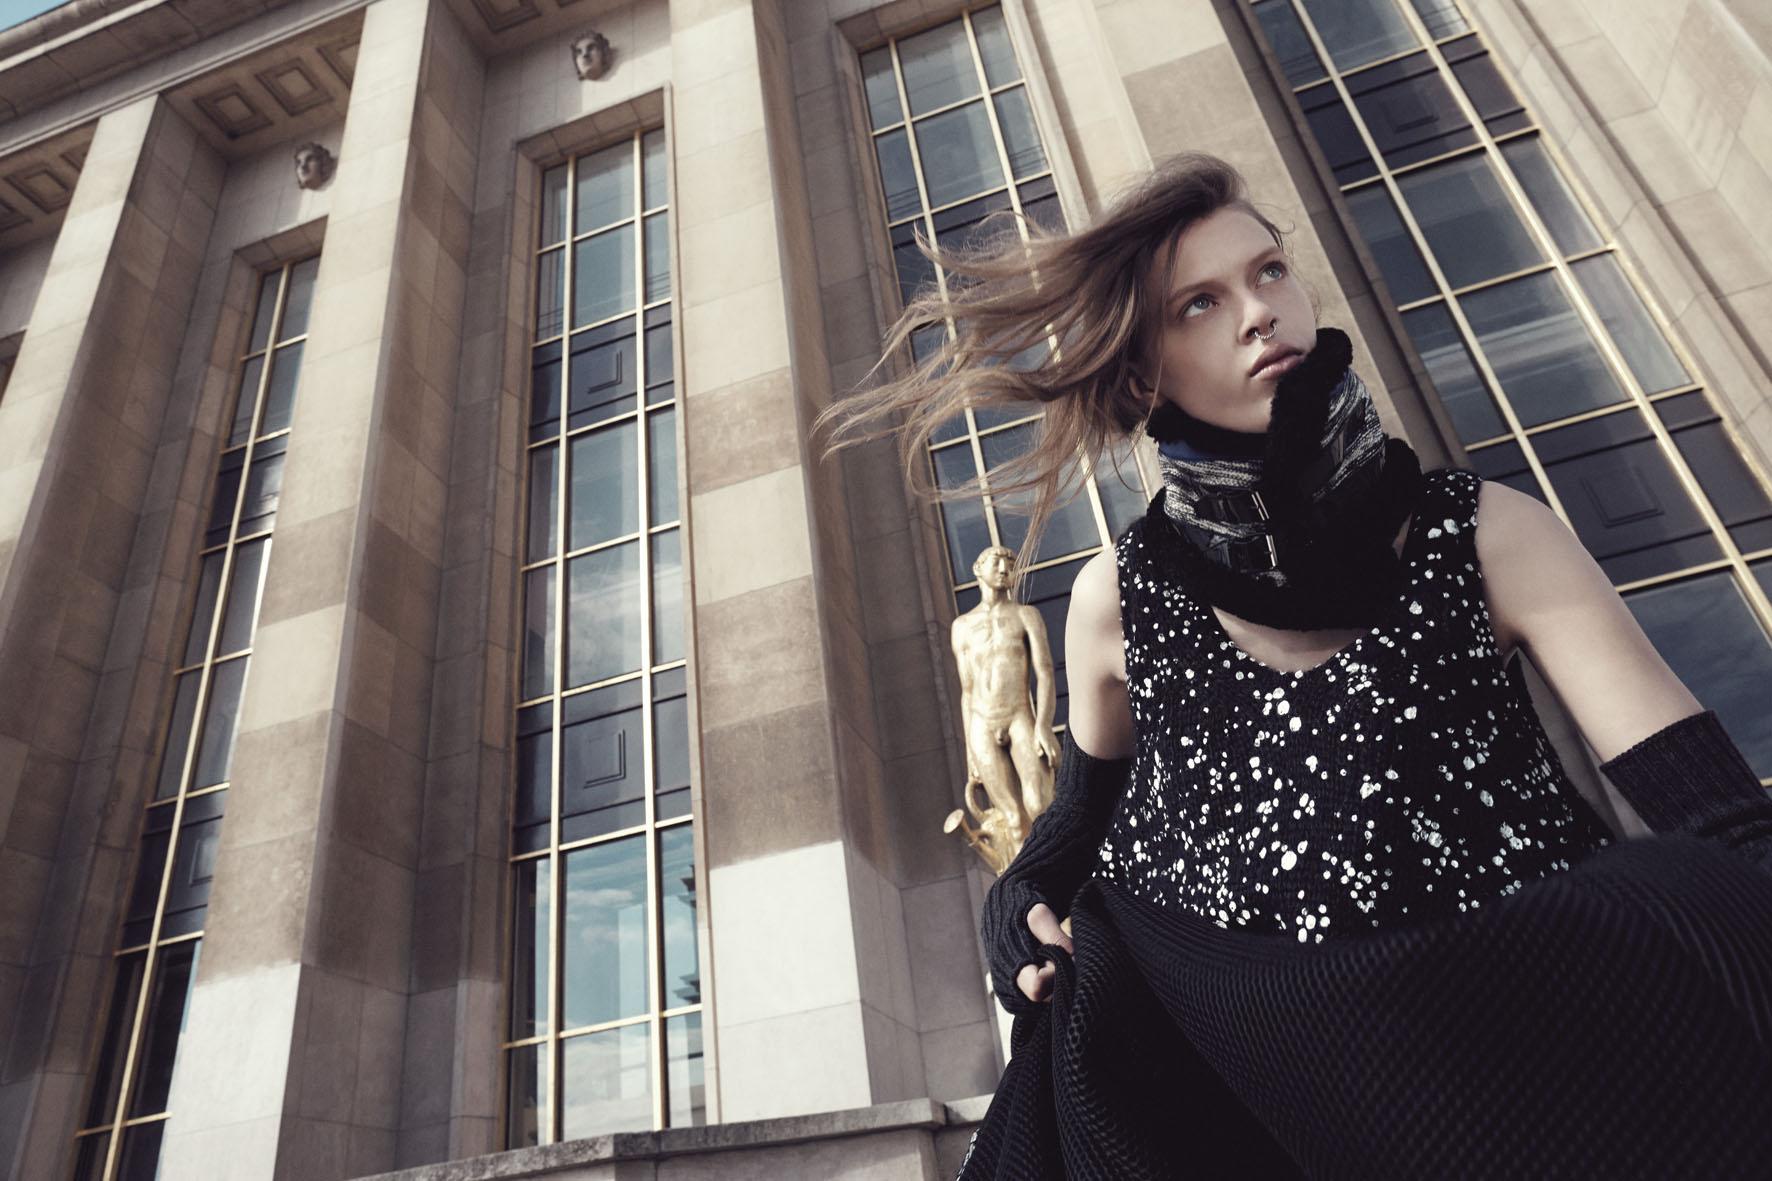 Marie Claire Italia November 2014 | Alessio Bolzoni | Marie Claire Italia | Ivana Spernicelli | Numerique Retouch Photo Retouching Studio